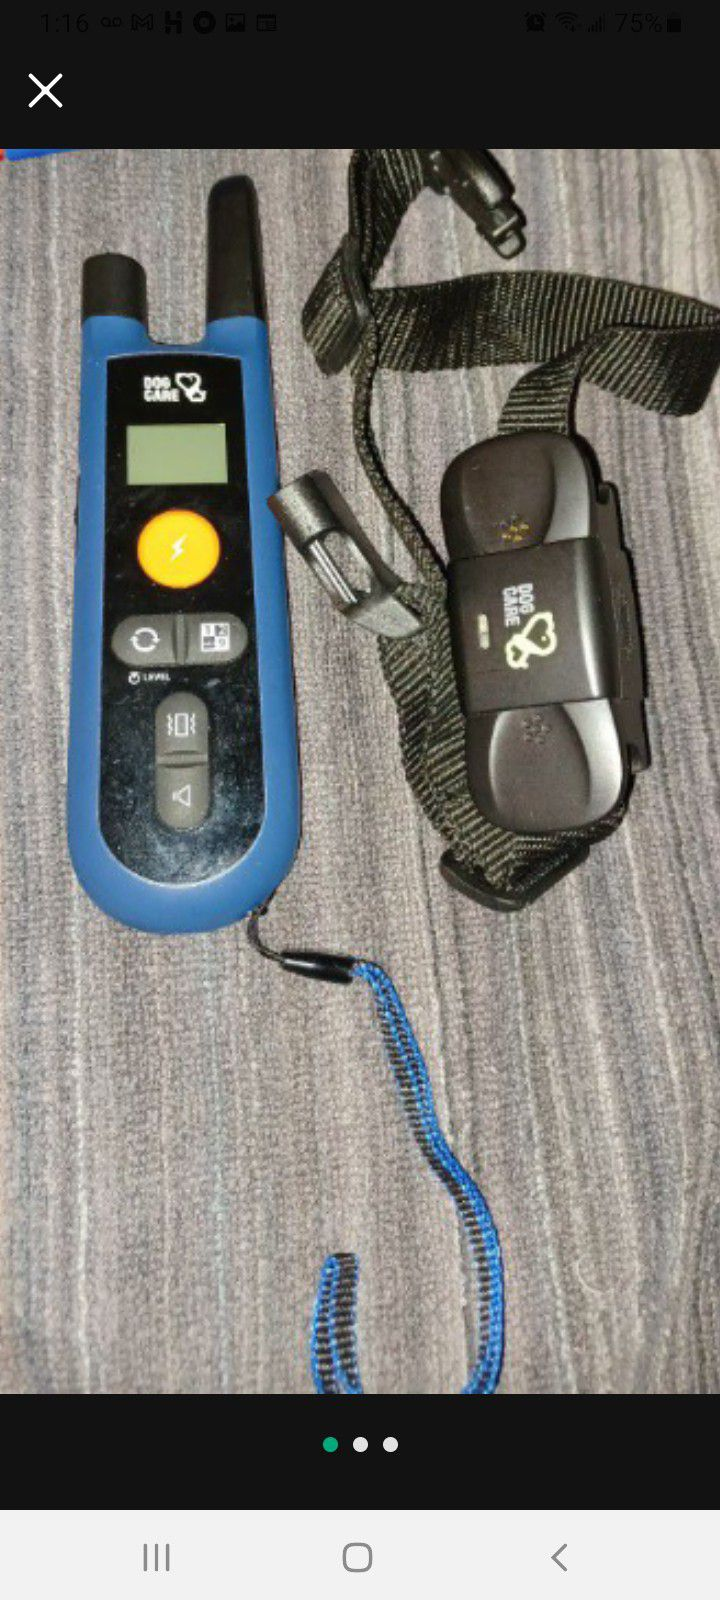 Dog CareDOG CARE Dog Training Collar- Rechargeable Training Collar with 3 Training Modes and Waterproof Vibration